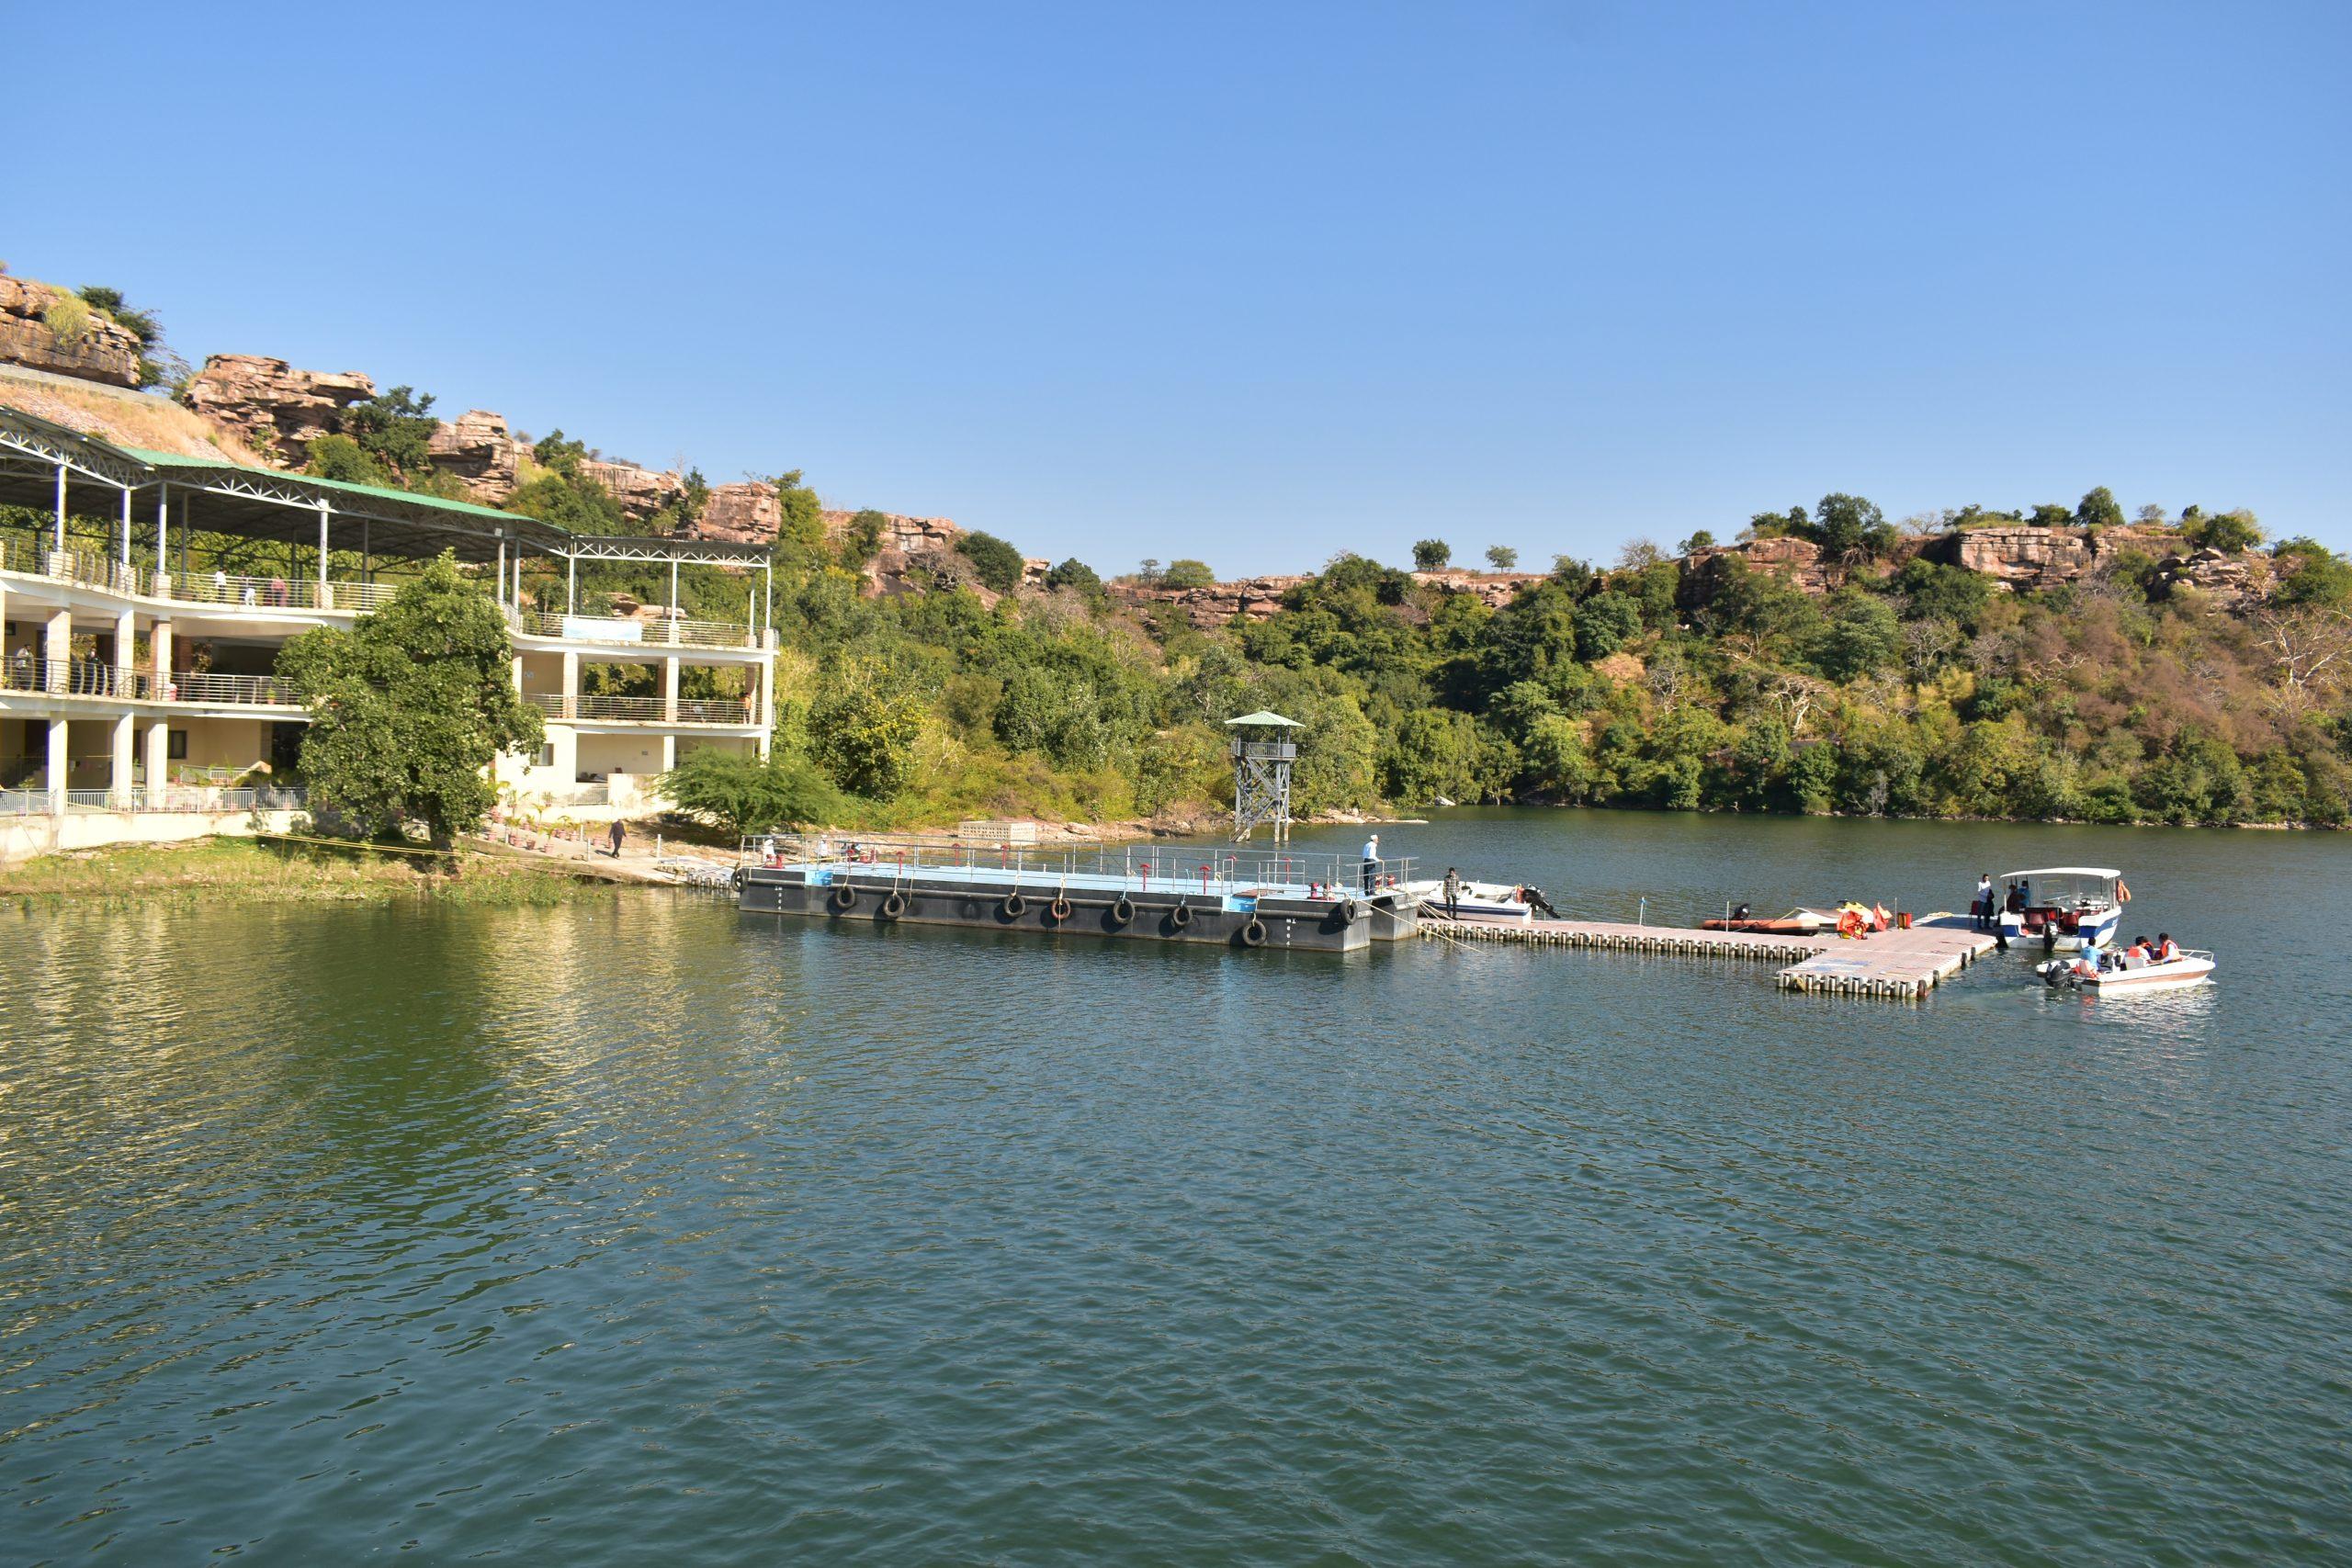 Boat club at Gandhi Sagar